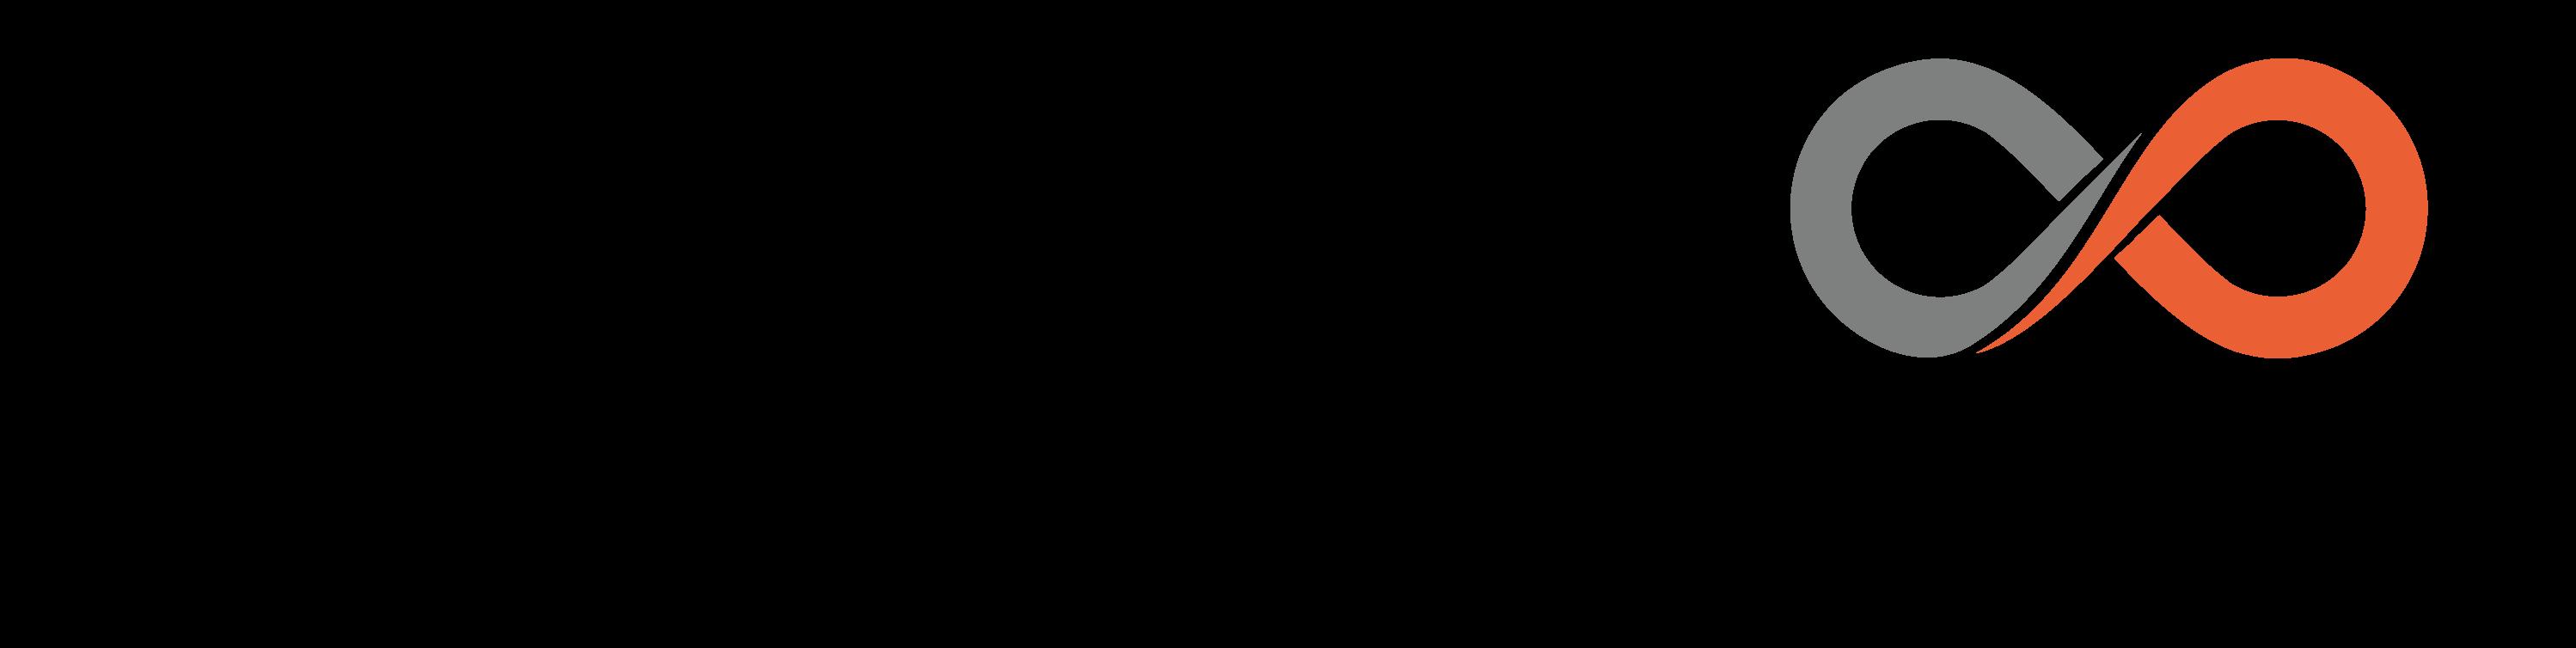 logo infinity 2019 DEF-08